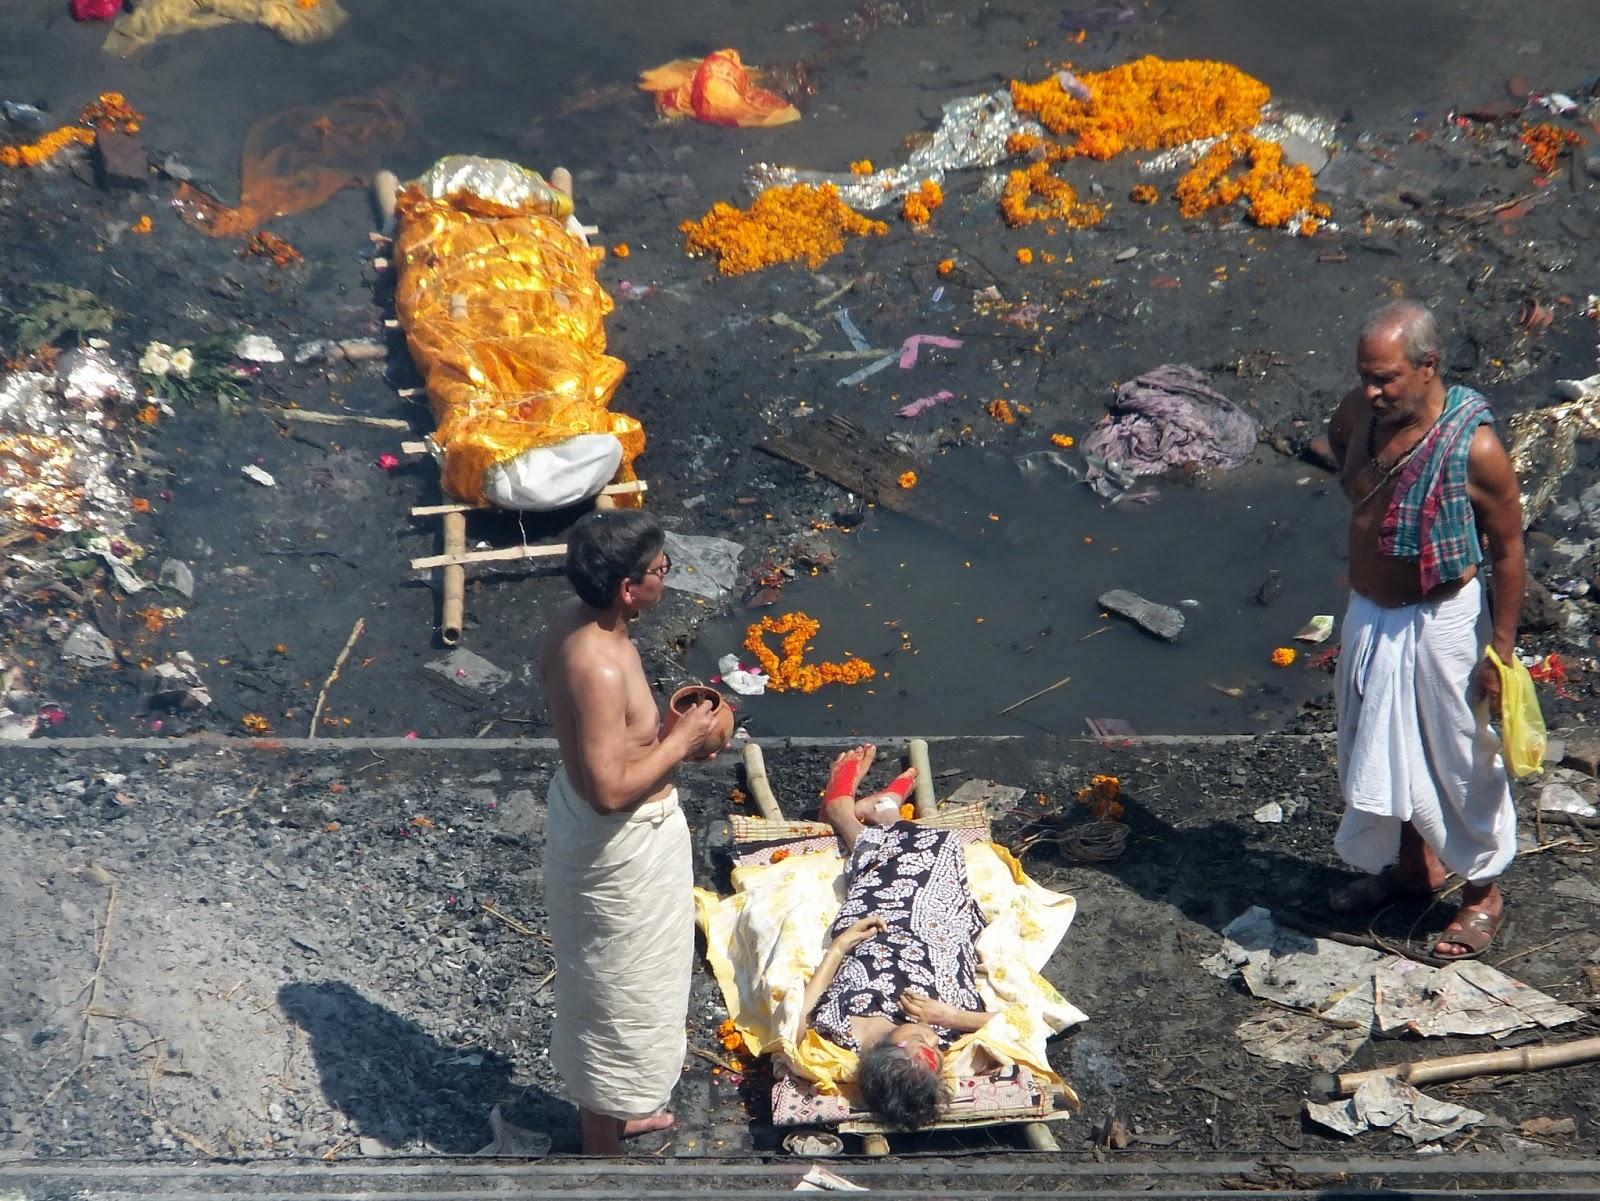 процесс кремации на берегу Ганга